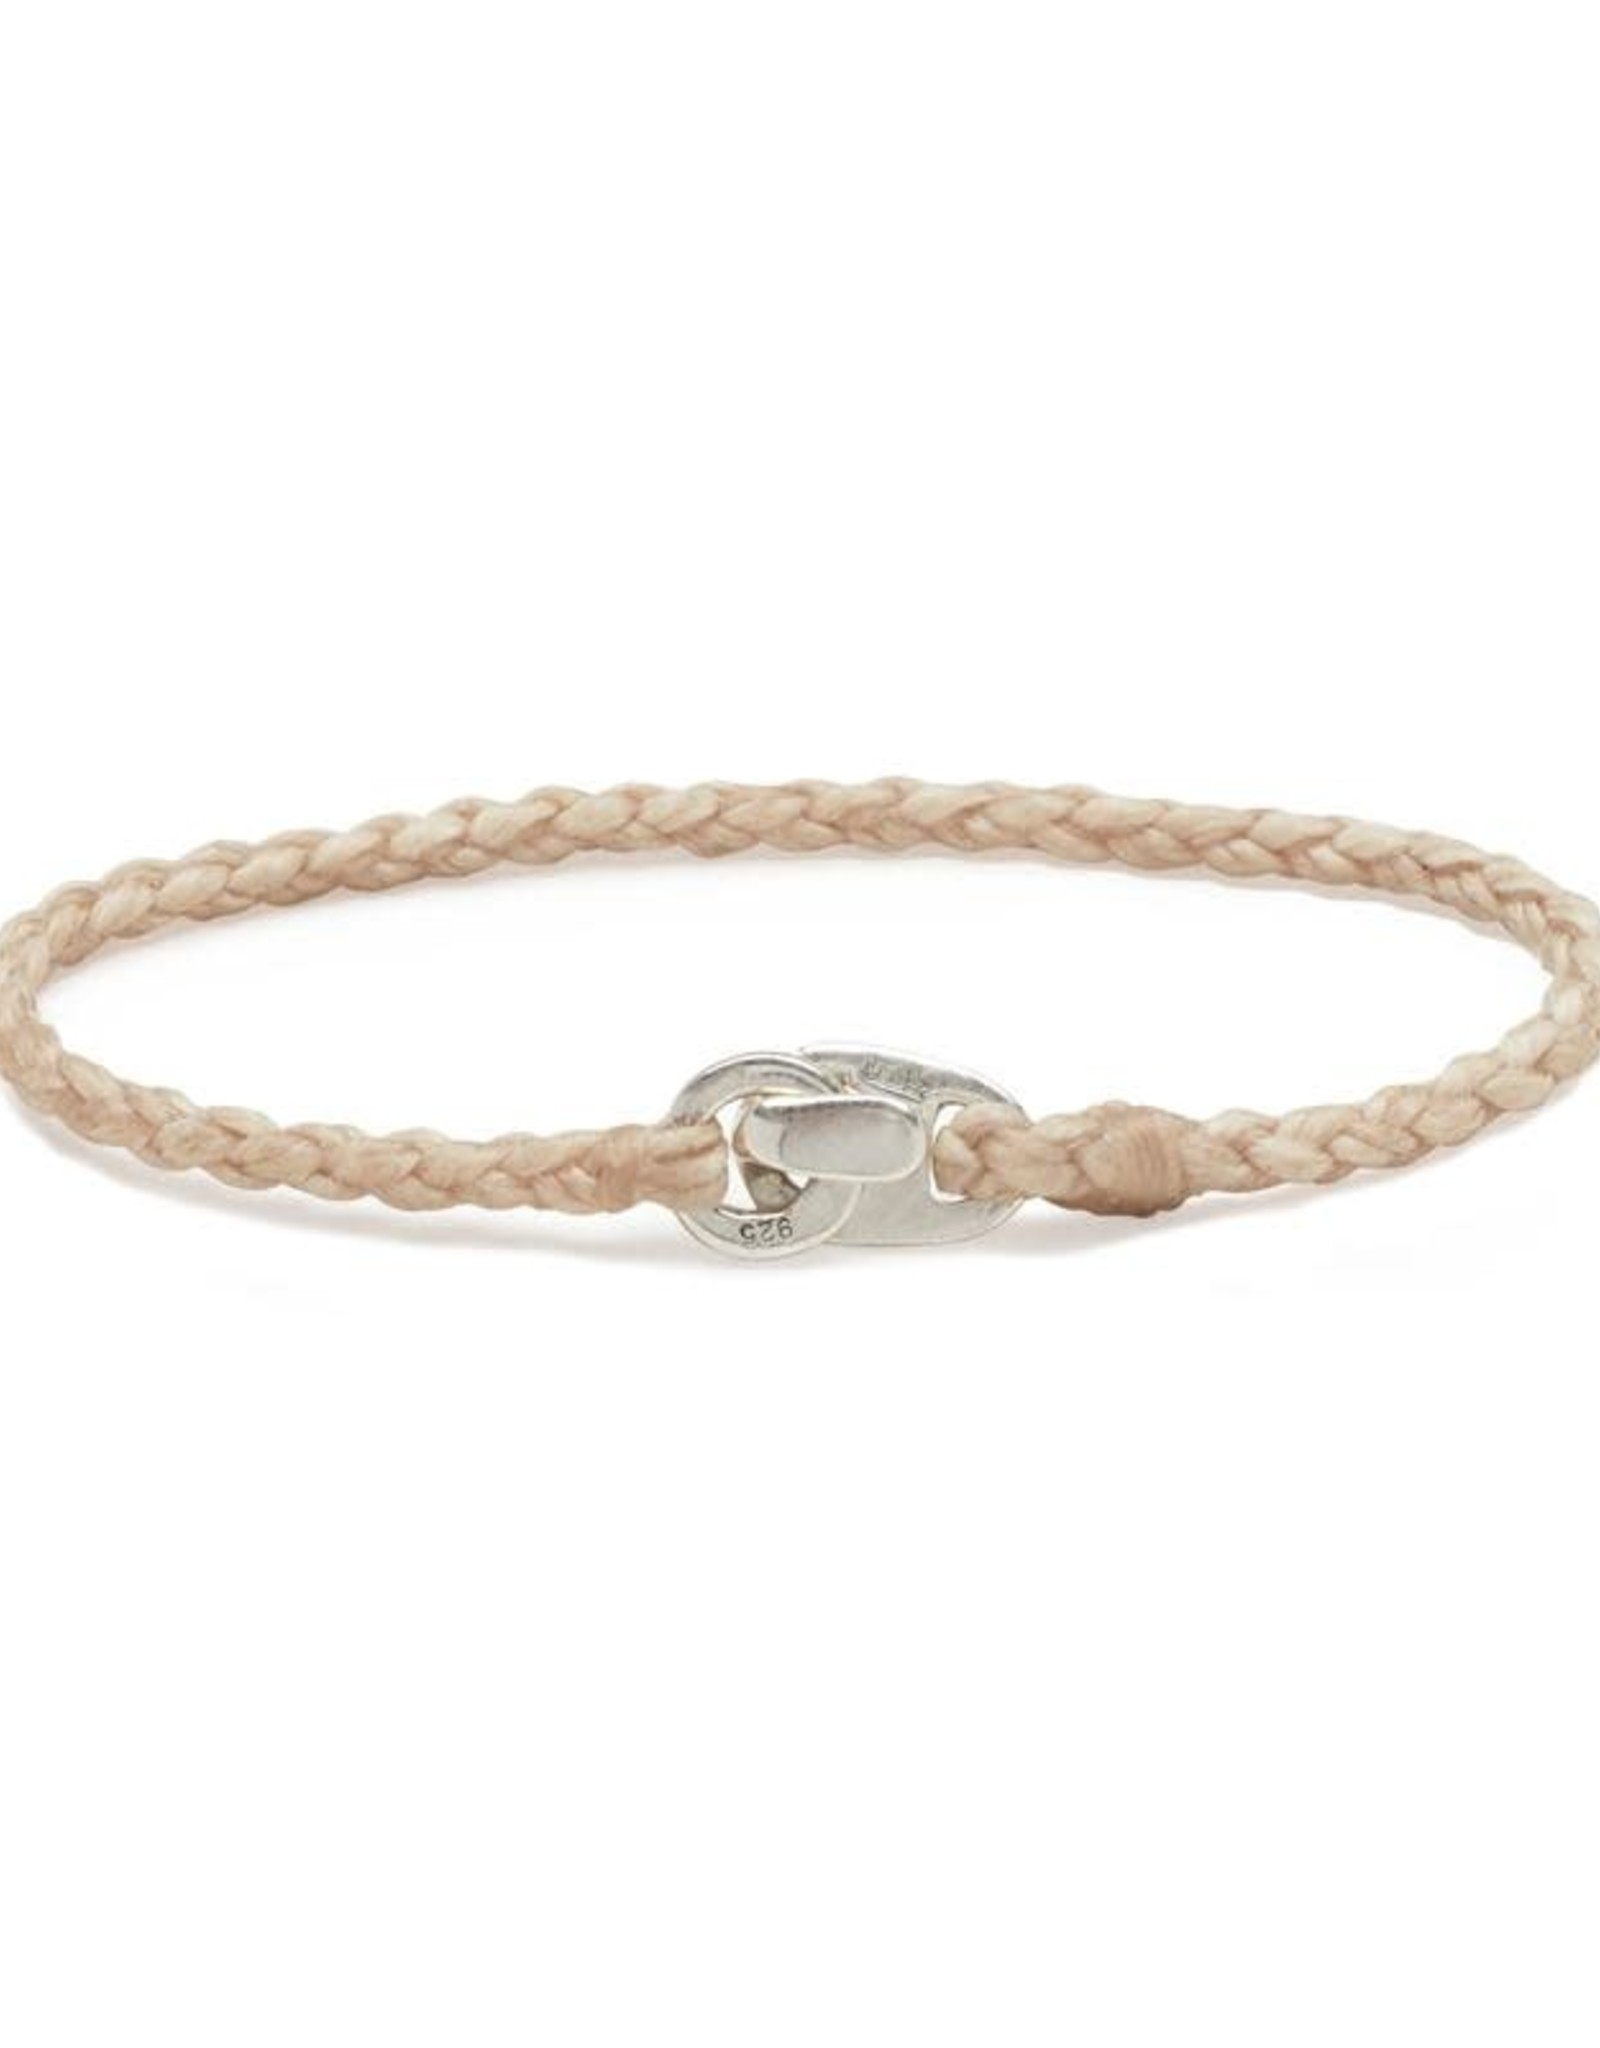 Scosha Single Wrap Silver Bracelet - Natural